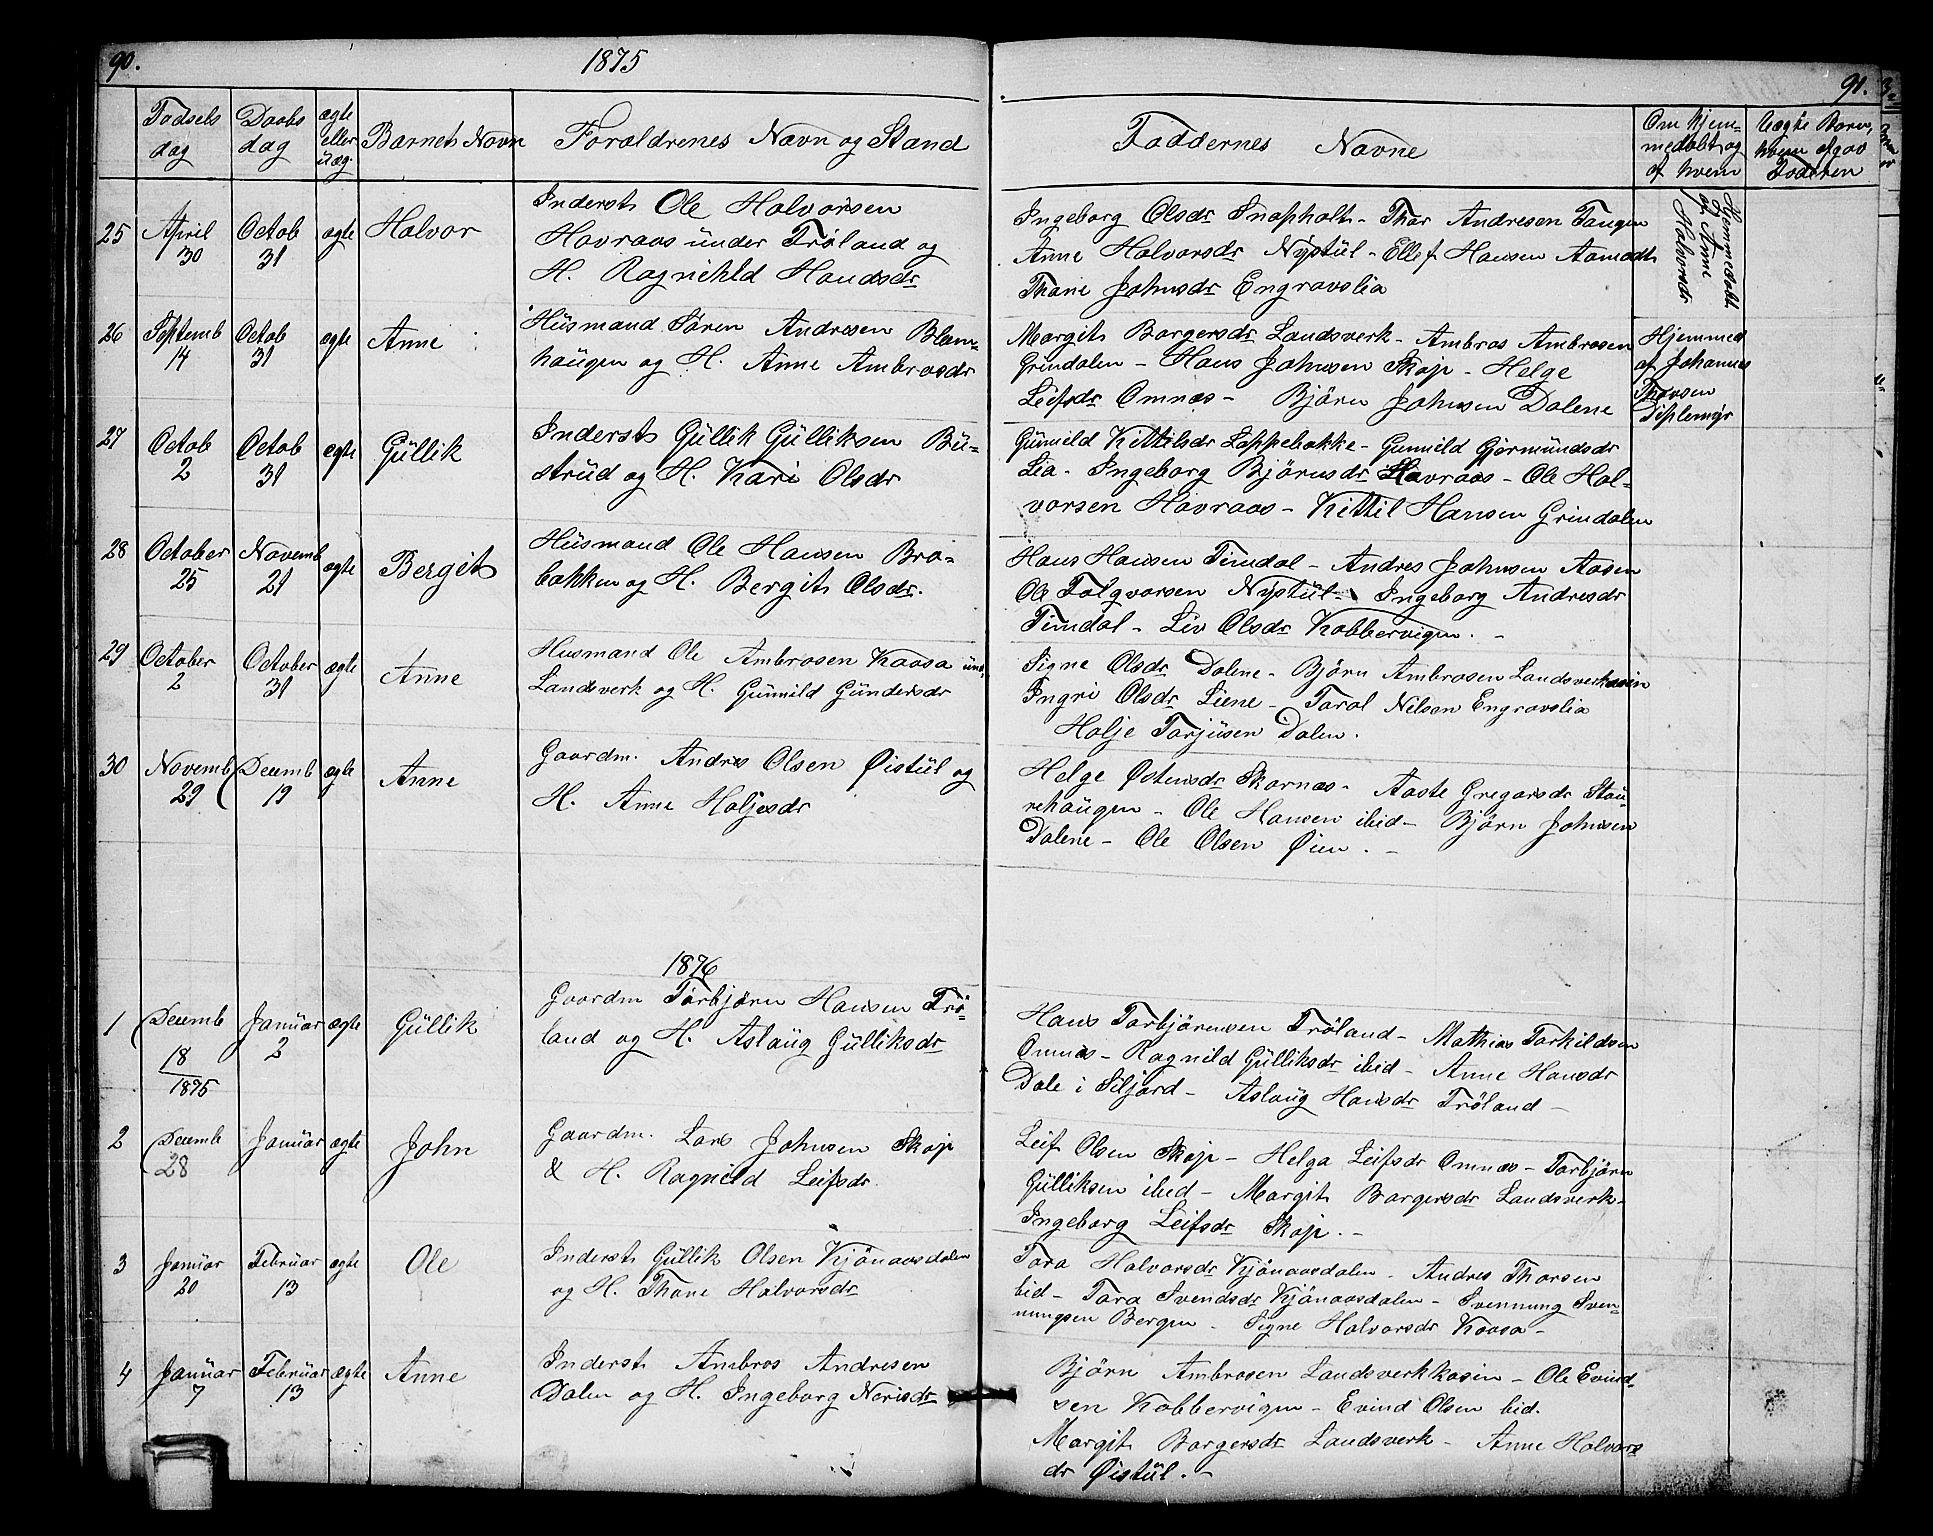 SAKO, Hjartdal kirkebøker, G/Gb/L0002: Klokkerbok nr. II 2, 1854-1884, s. 90-91